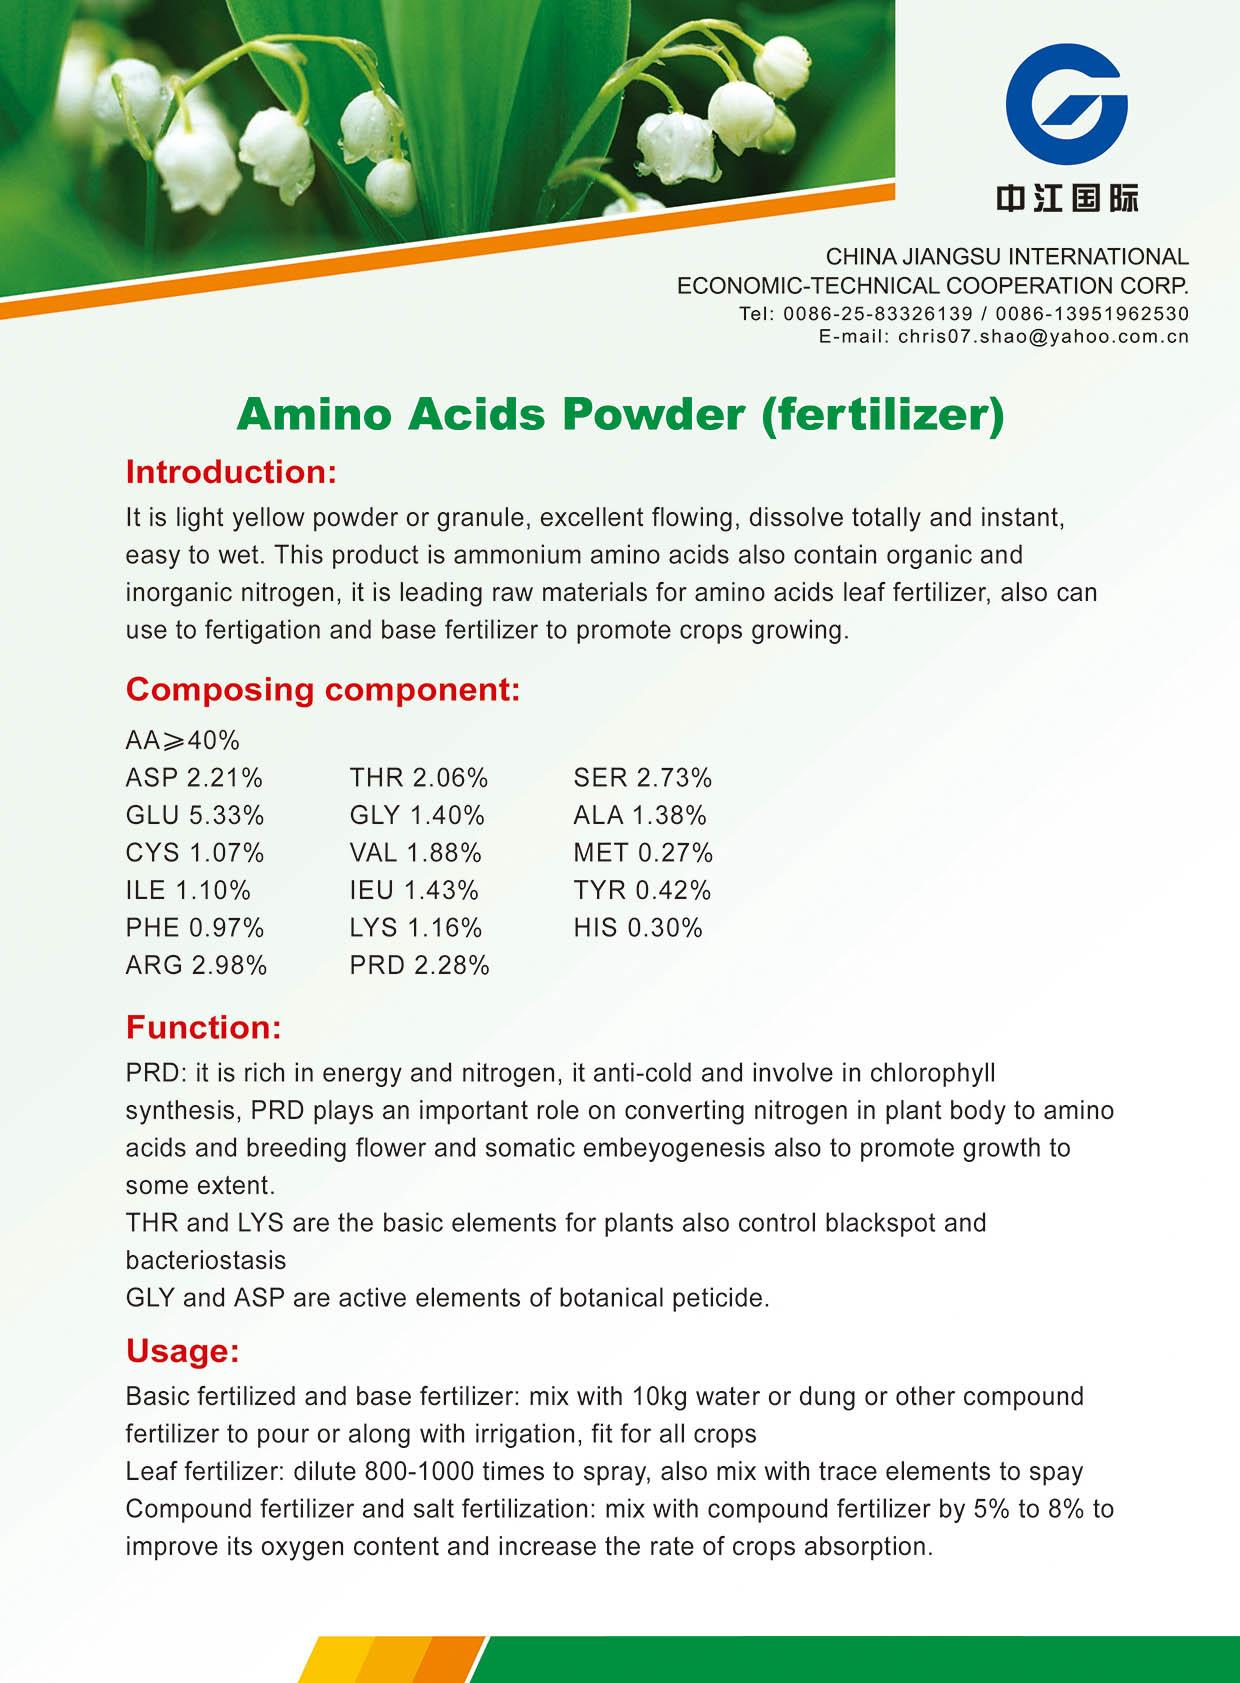 Amino Acids Powder